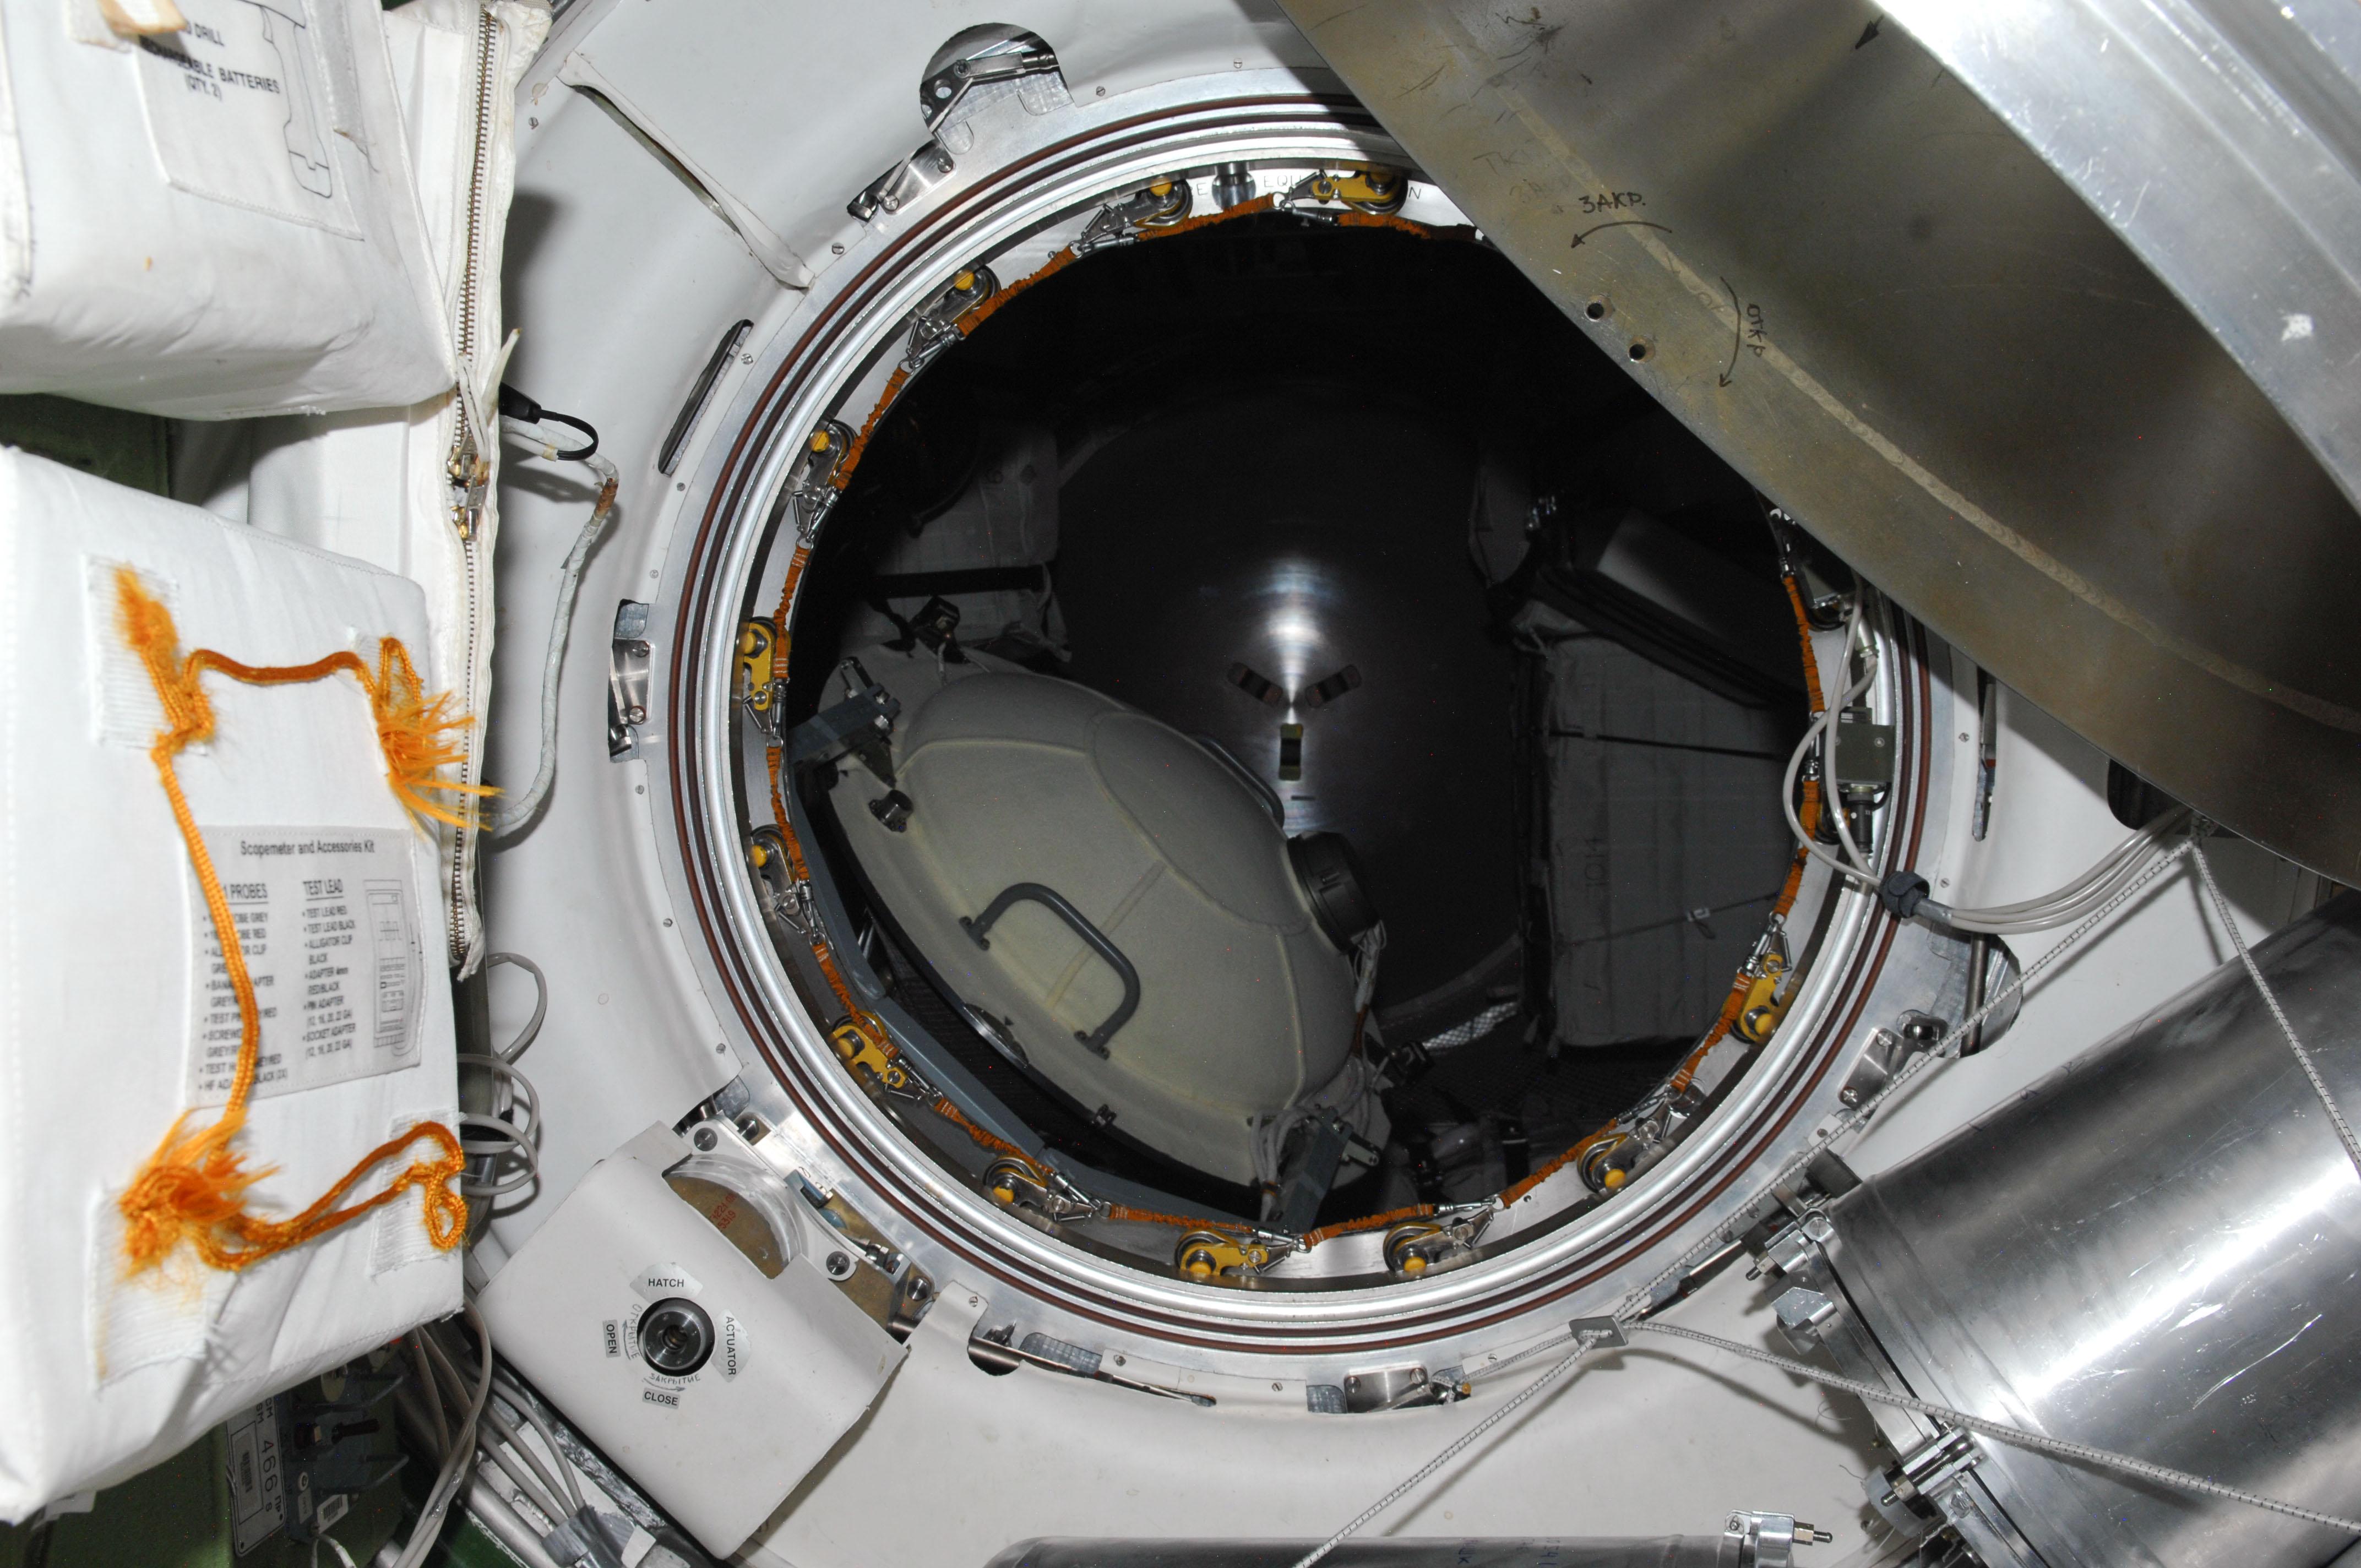 space shuttle b. hatch - photo #37